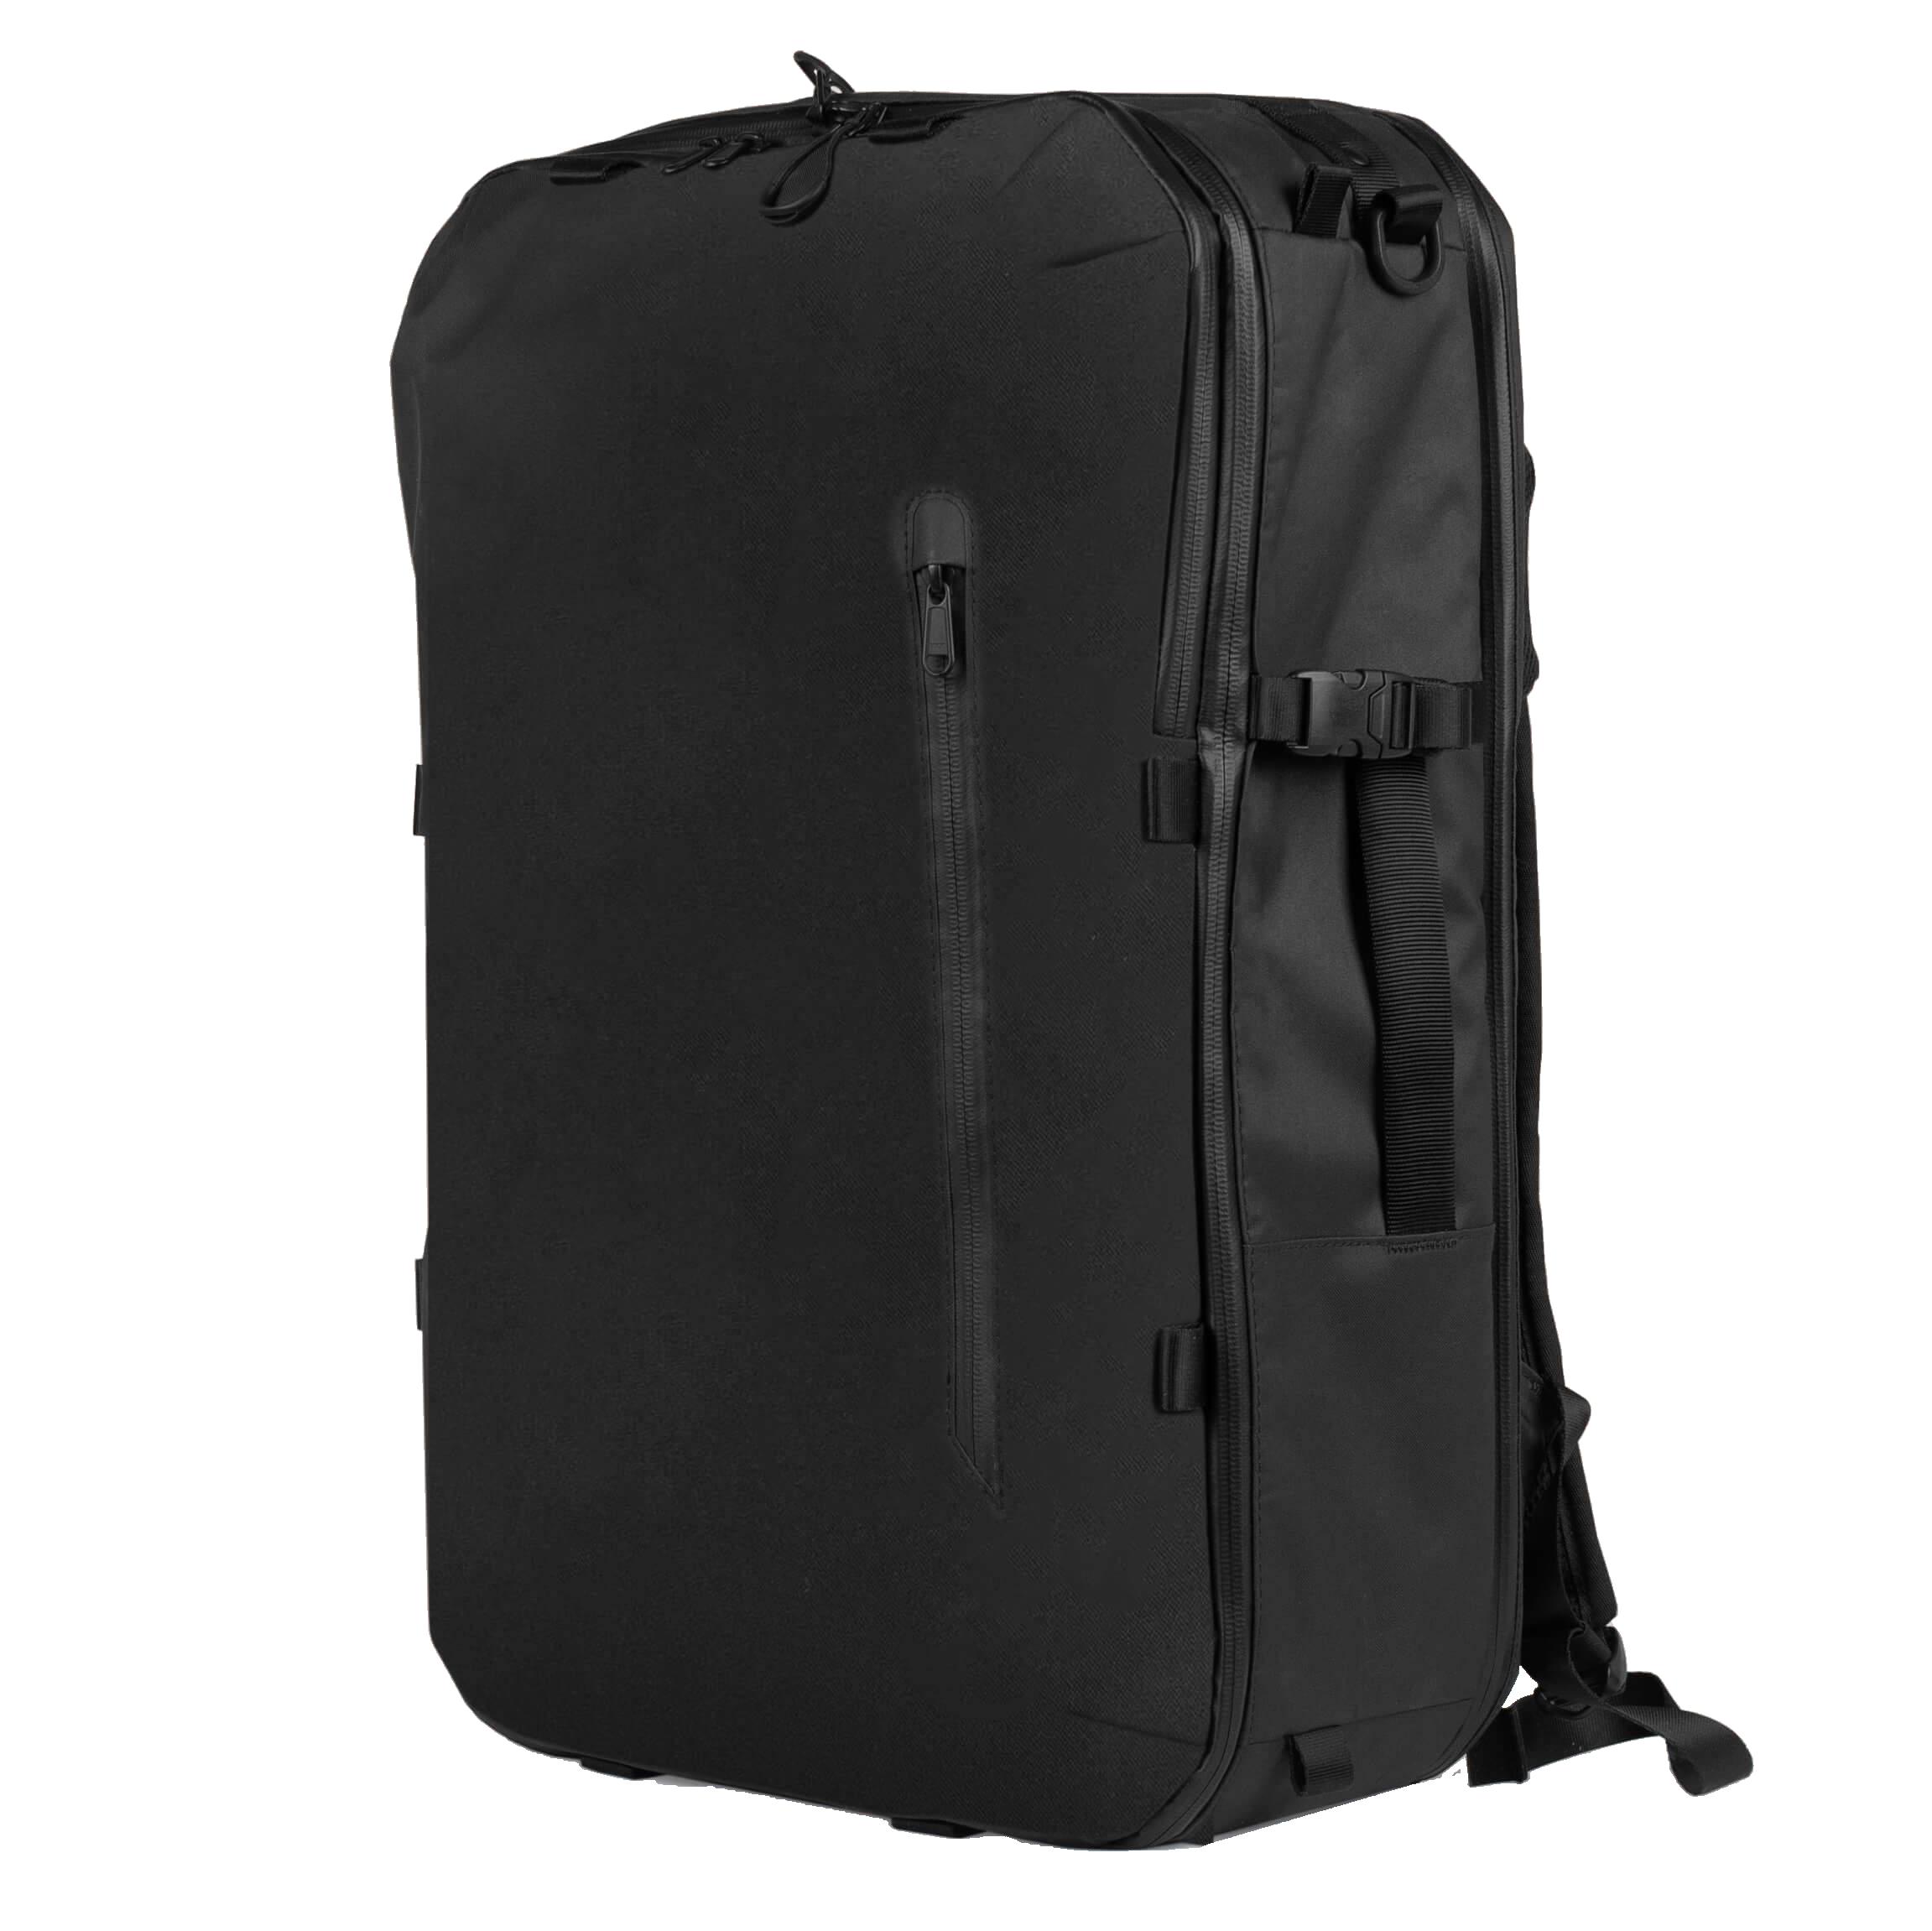 42L Backpack